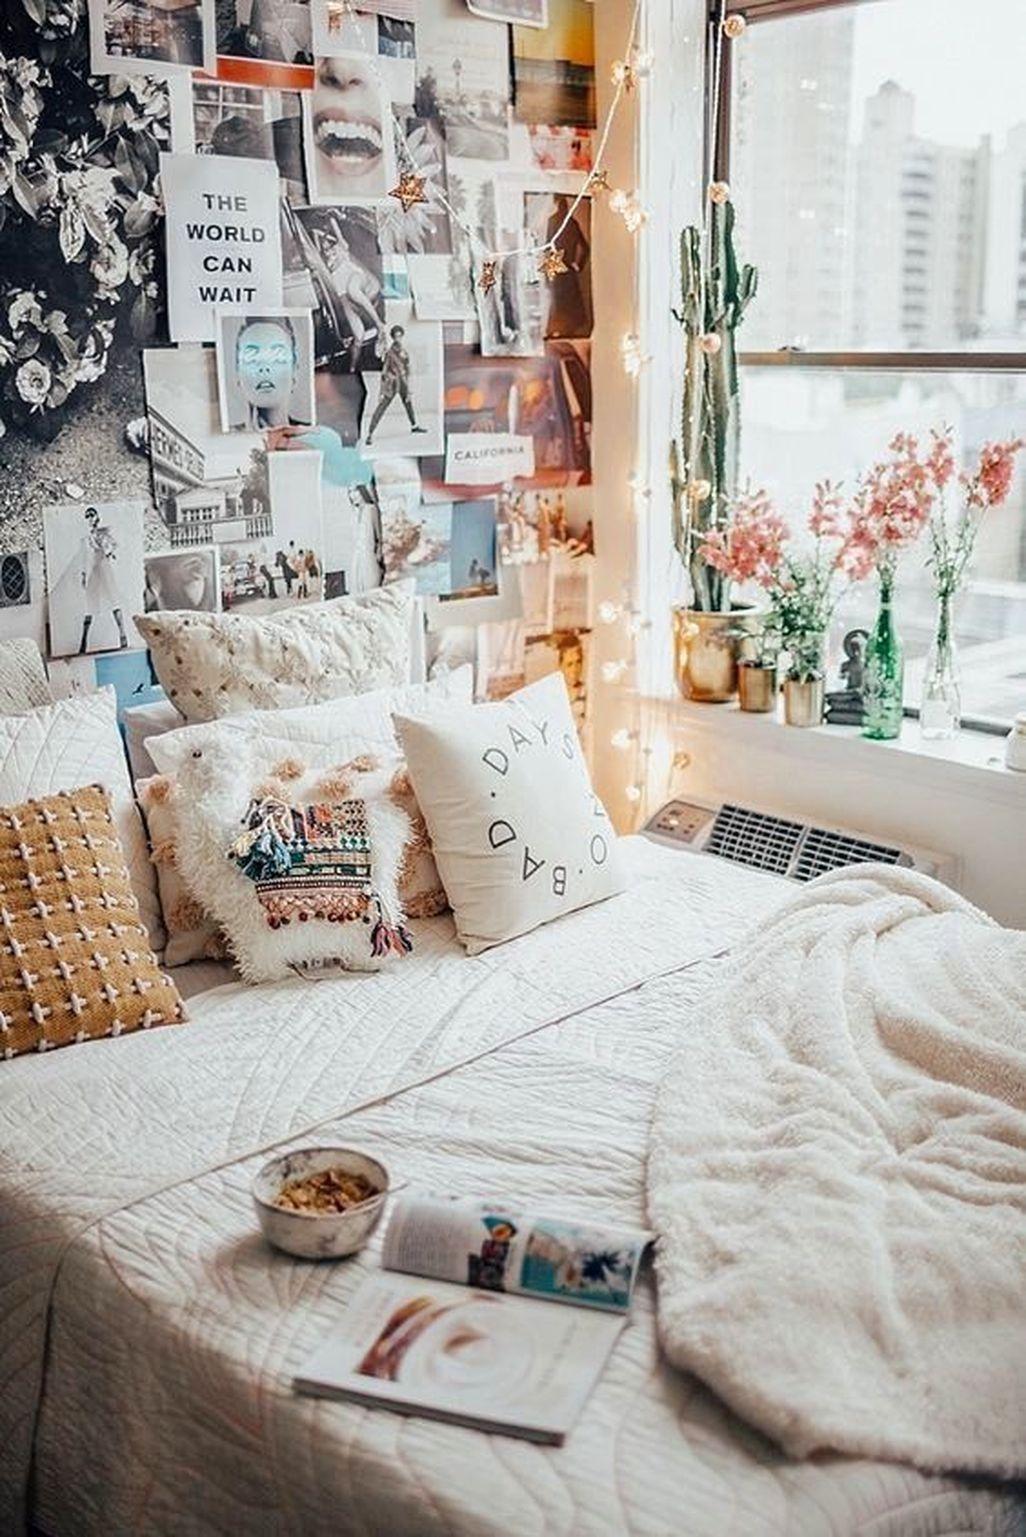 50 Cute Diy Dorm Room Decorating Ideas On A Budget